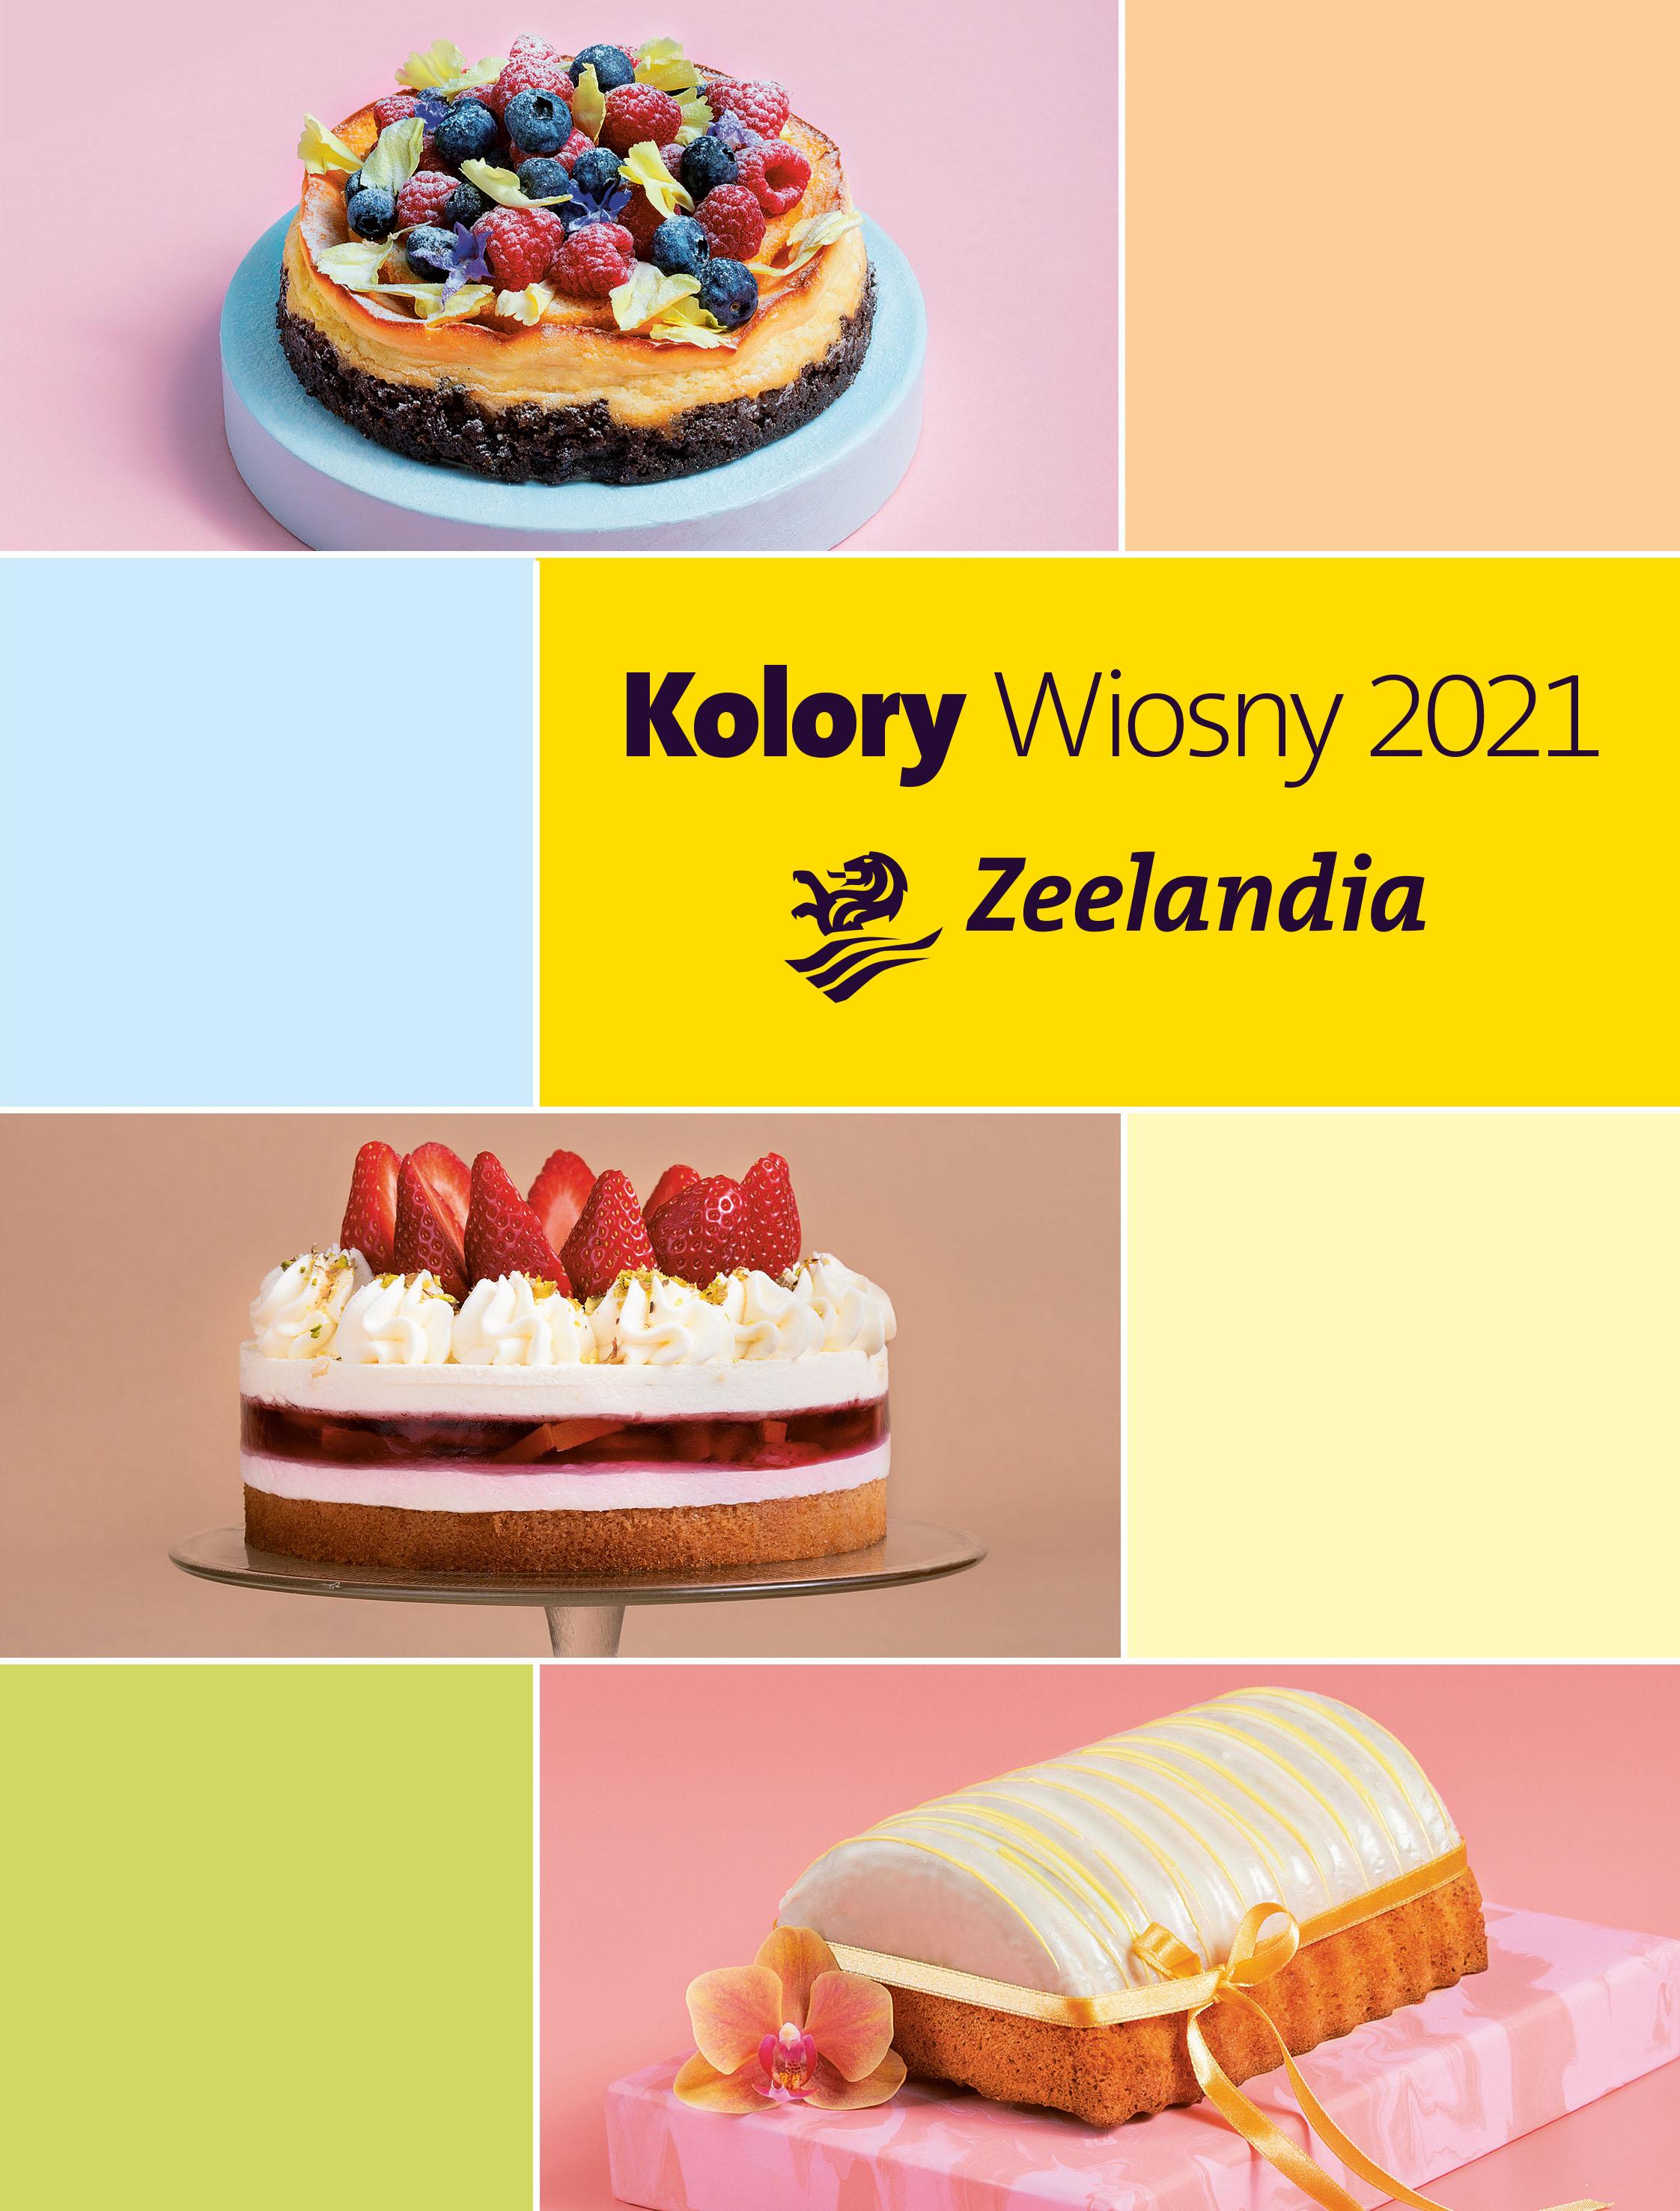 ZEELANDIA Kolory Wiosny 2021-1.jpg